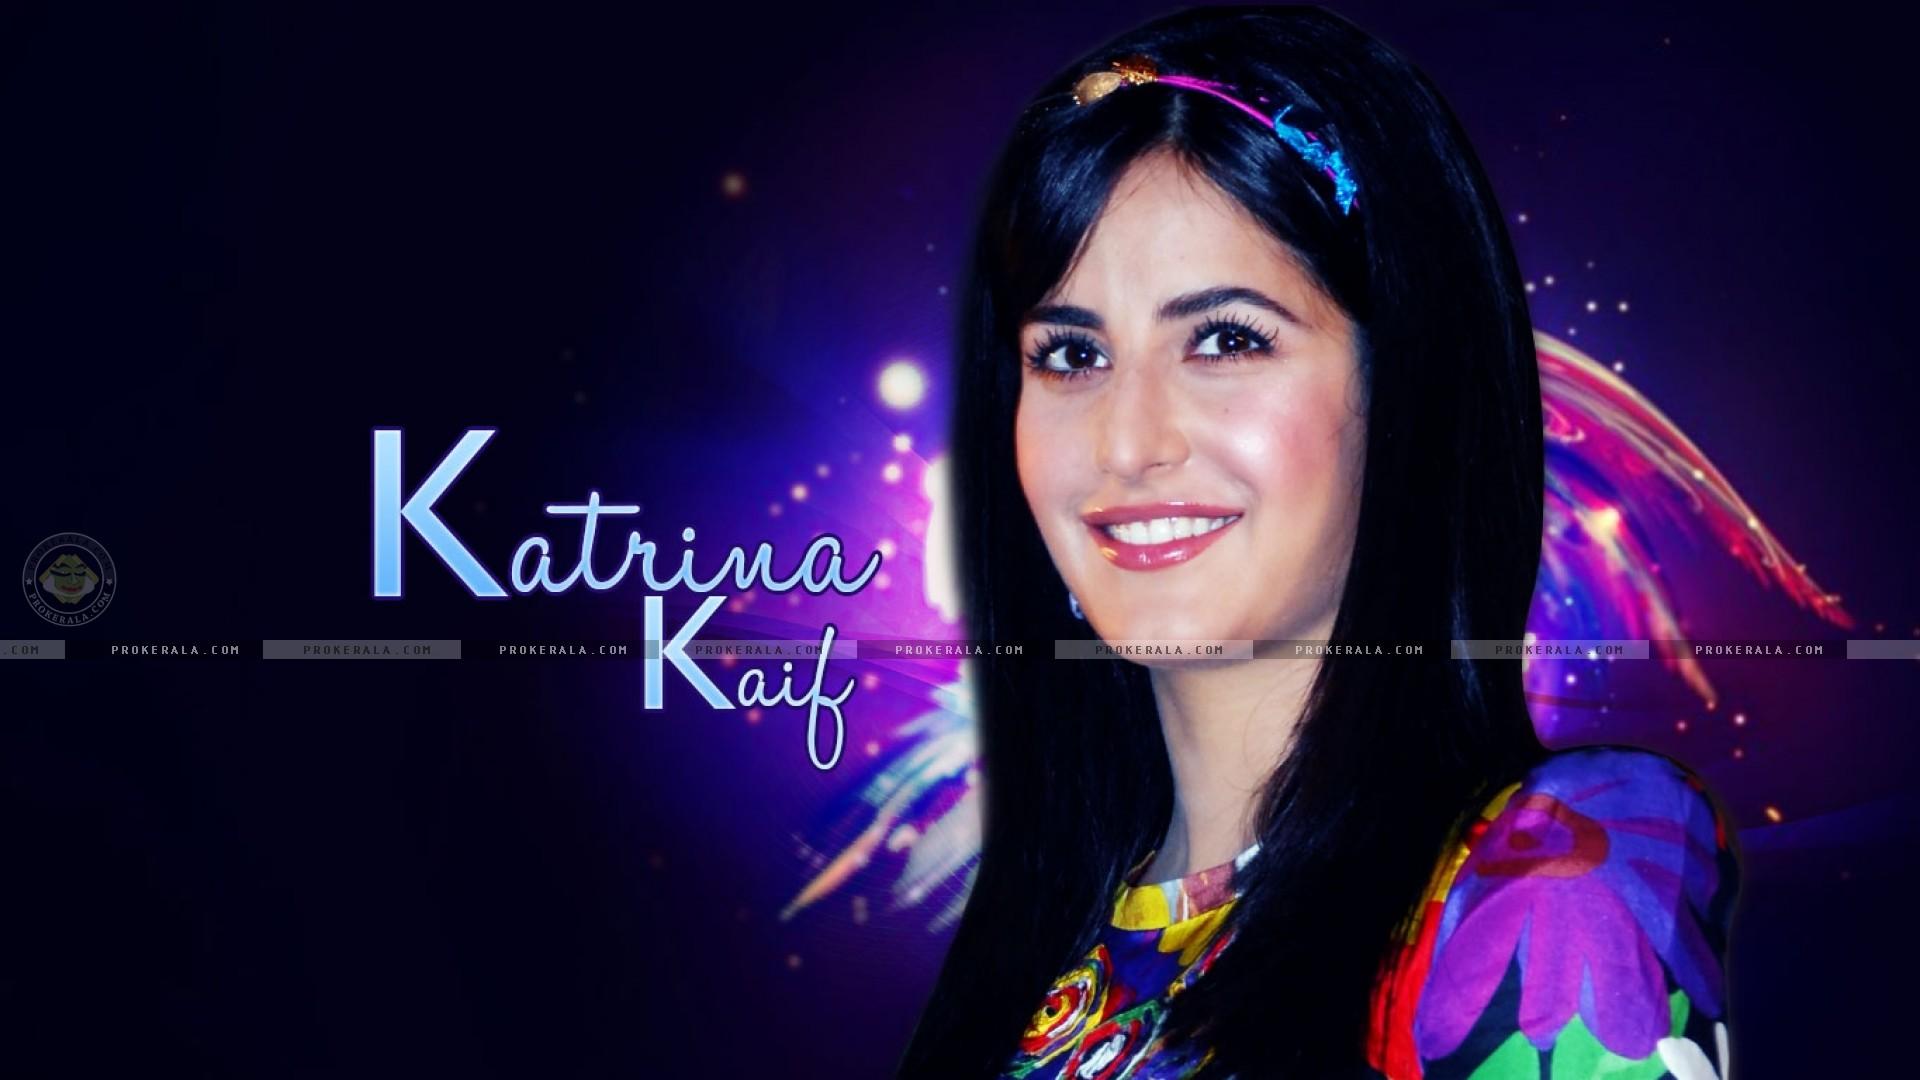 Katrina Kaif wallpaper HD download bolliwood